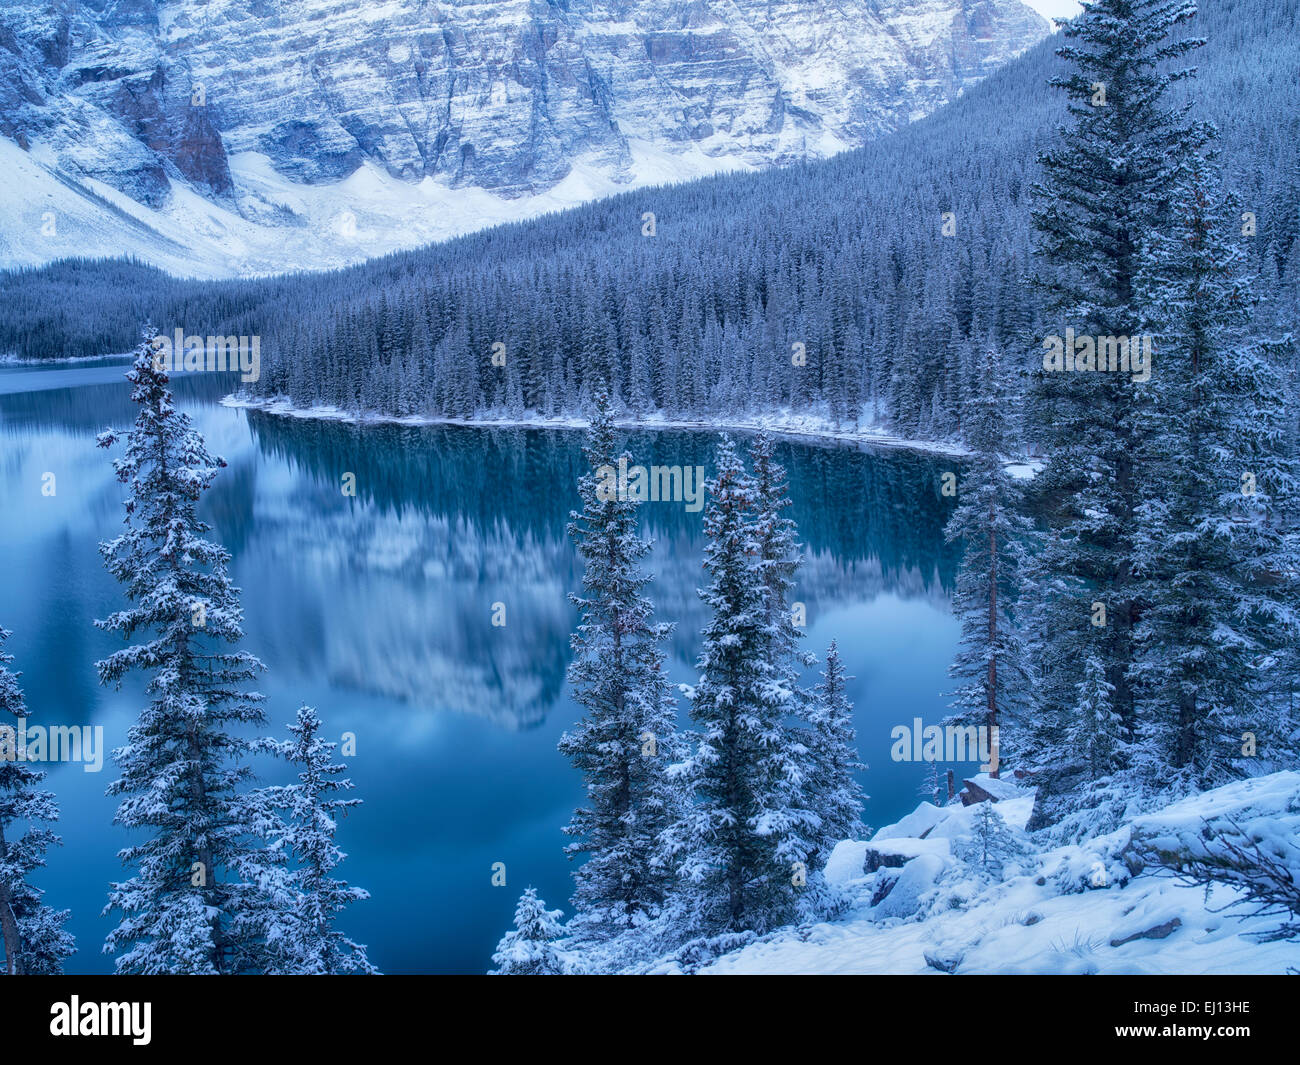 Erster Schnee der Saison auf Moraine Lake. Banff Nationalpark, Alberta, Kanada Stockbild